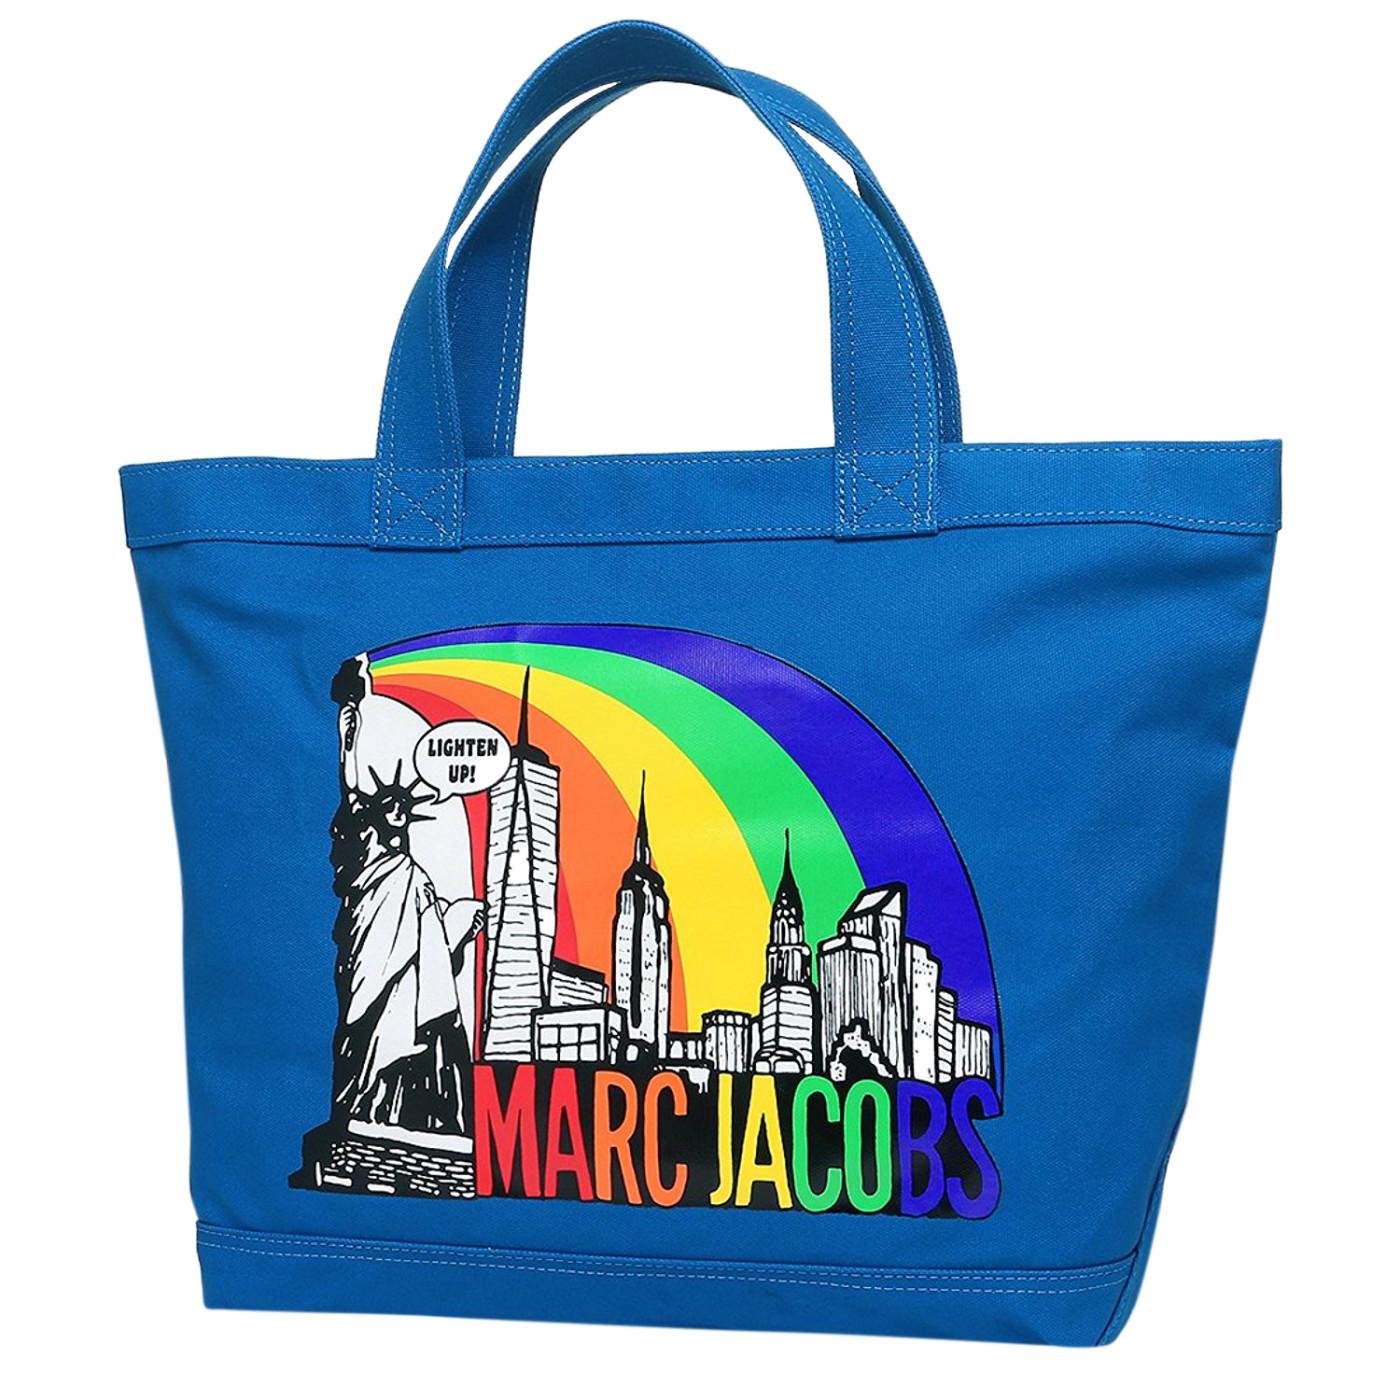 9e723d37df6f Marc Jacobs New York Print Cotton Zip Shopper Tote Bag